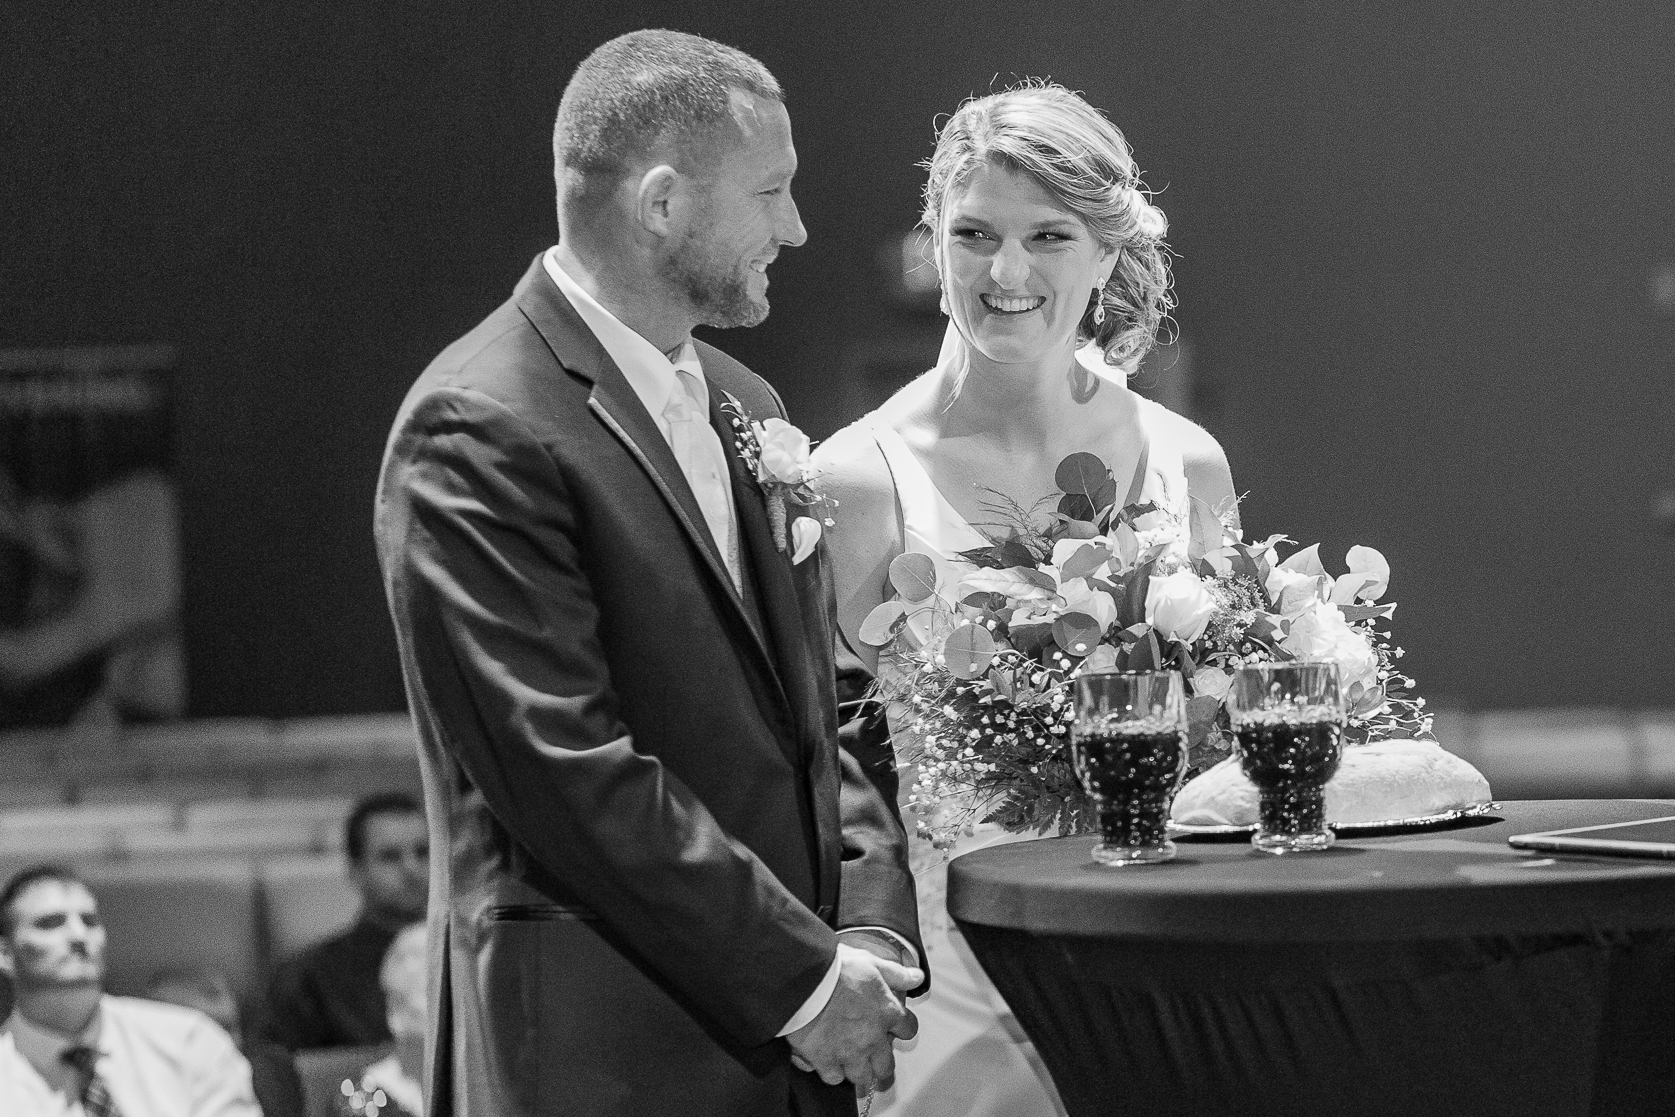 Pennsylvania October Fall Lehigh Valley wedding and lifestyle photographer Lytle Photo Co (79 of 167).jpg